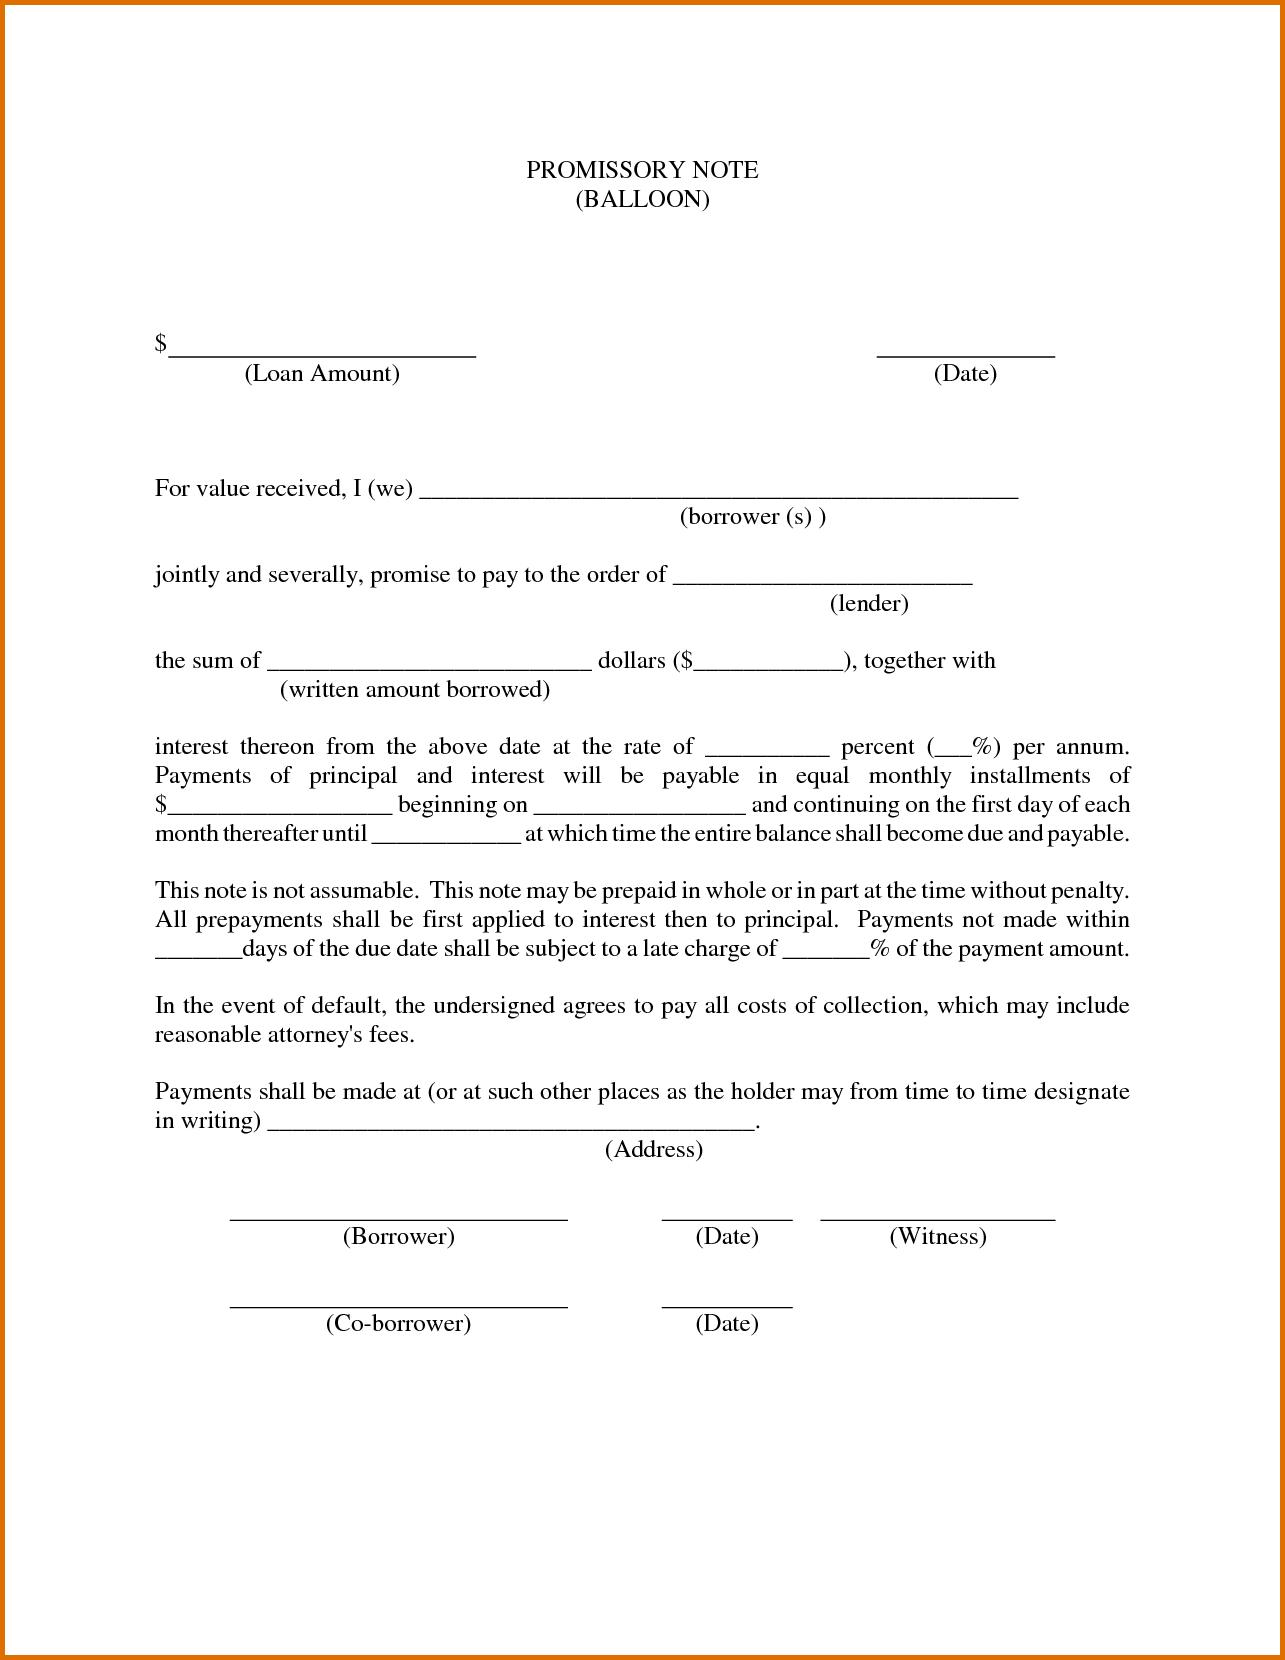 018 Template Ideas Free Promissory Note For Personal Loan ~ Ulyssesroom - Free Printable Promissory Note For Personal Loan